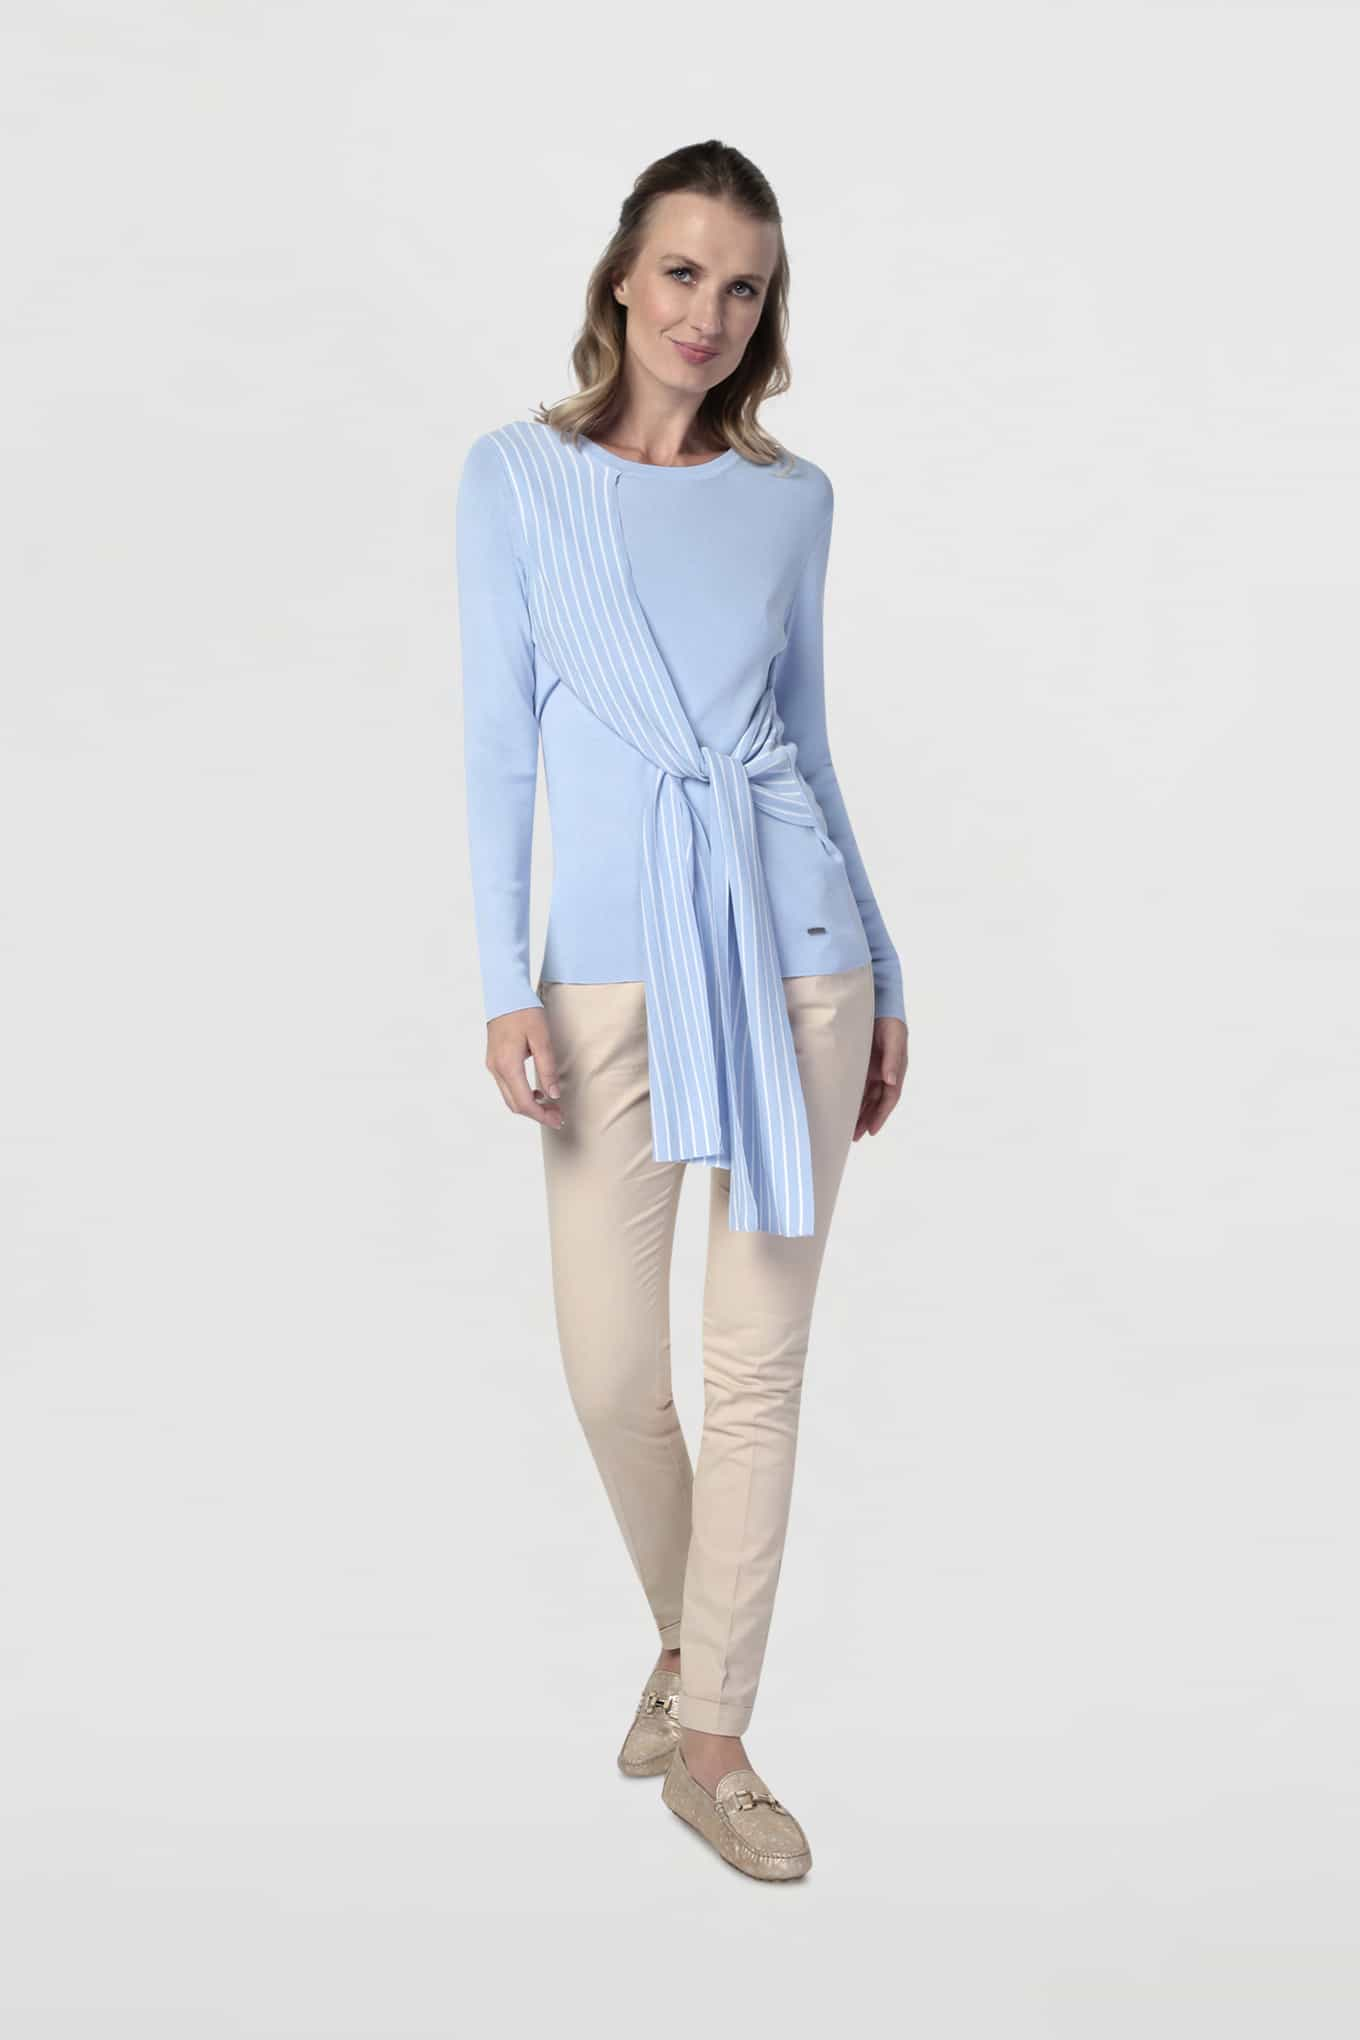 Sweater Light Blue Casual Woman